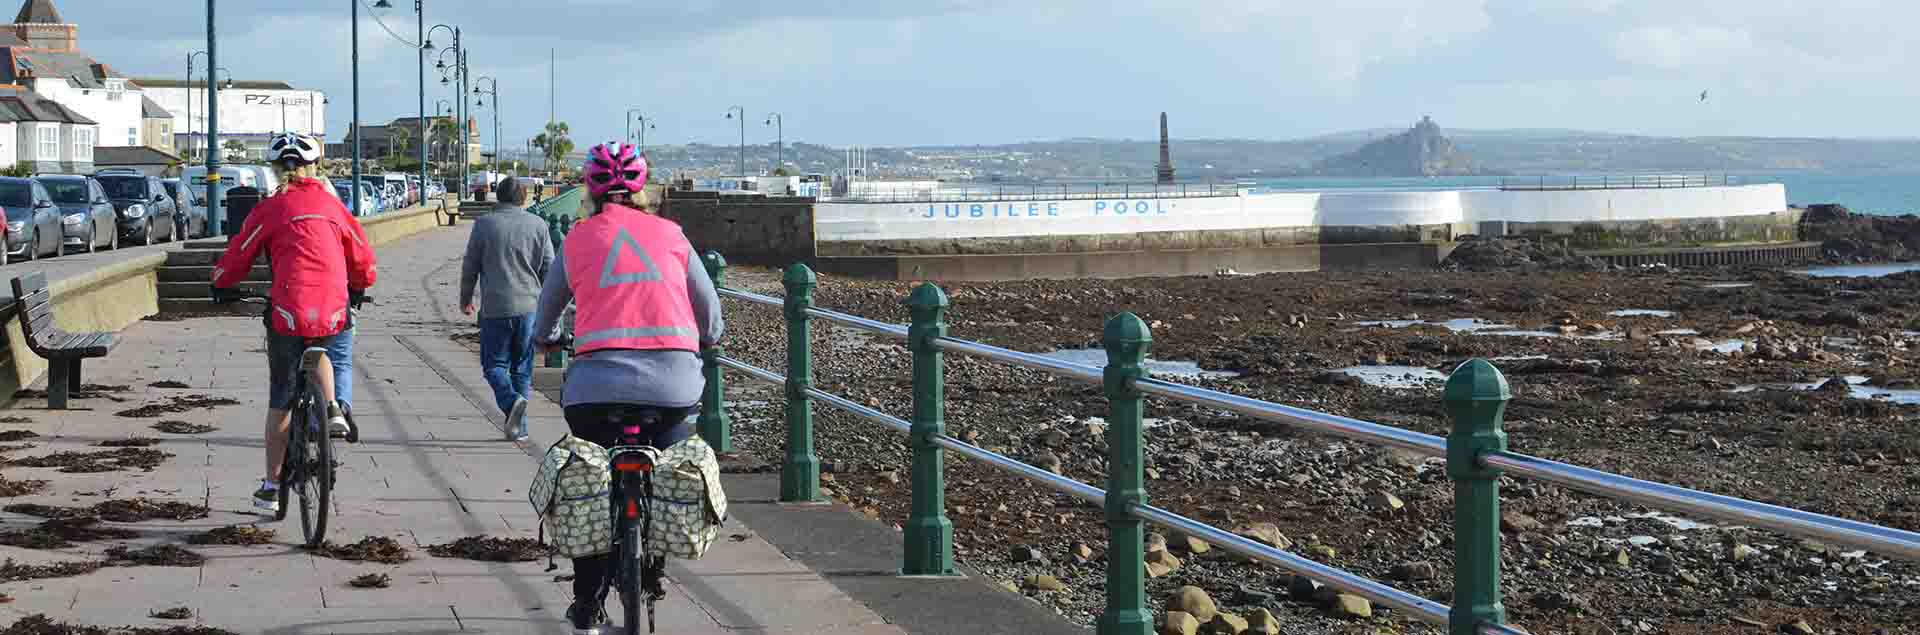 Cycling along the Penzance Promenade in Cornwall